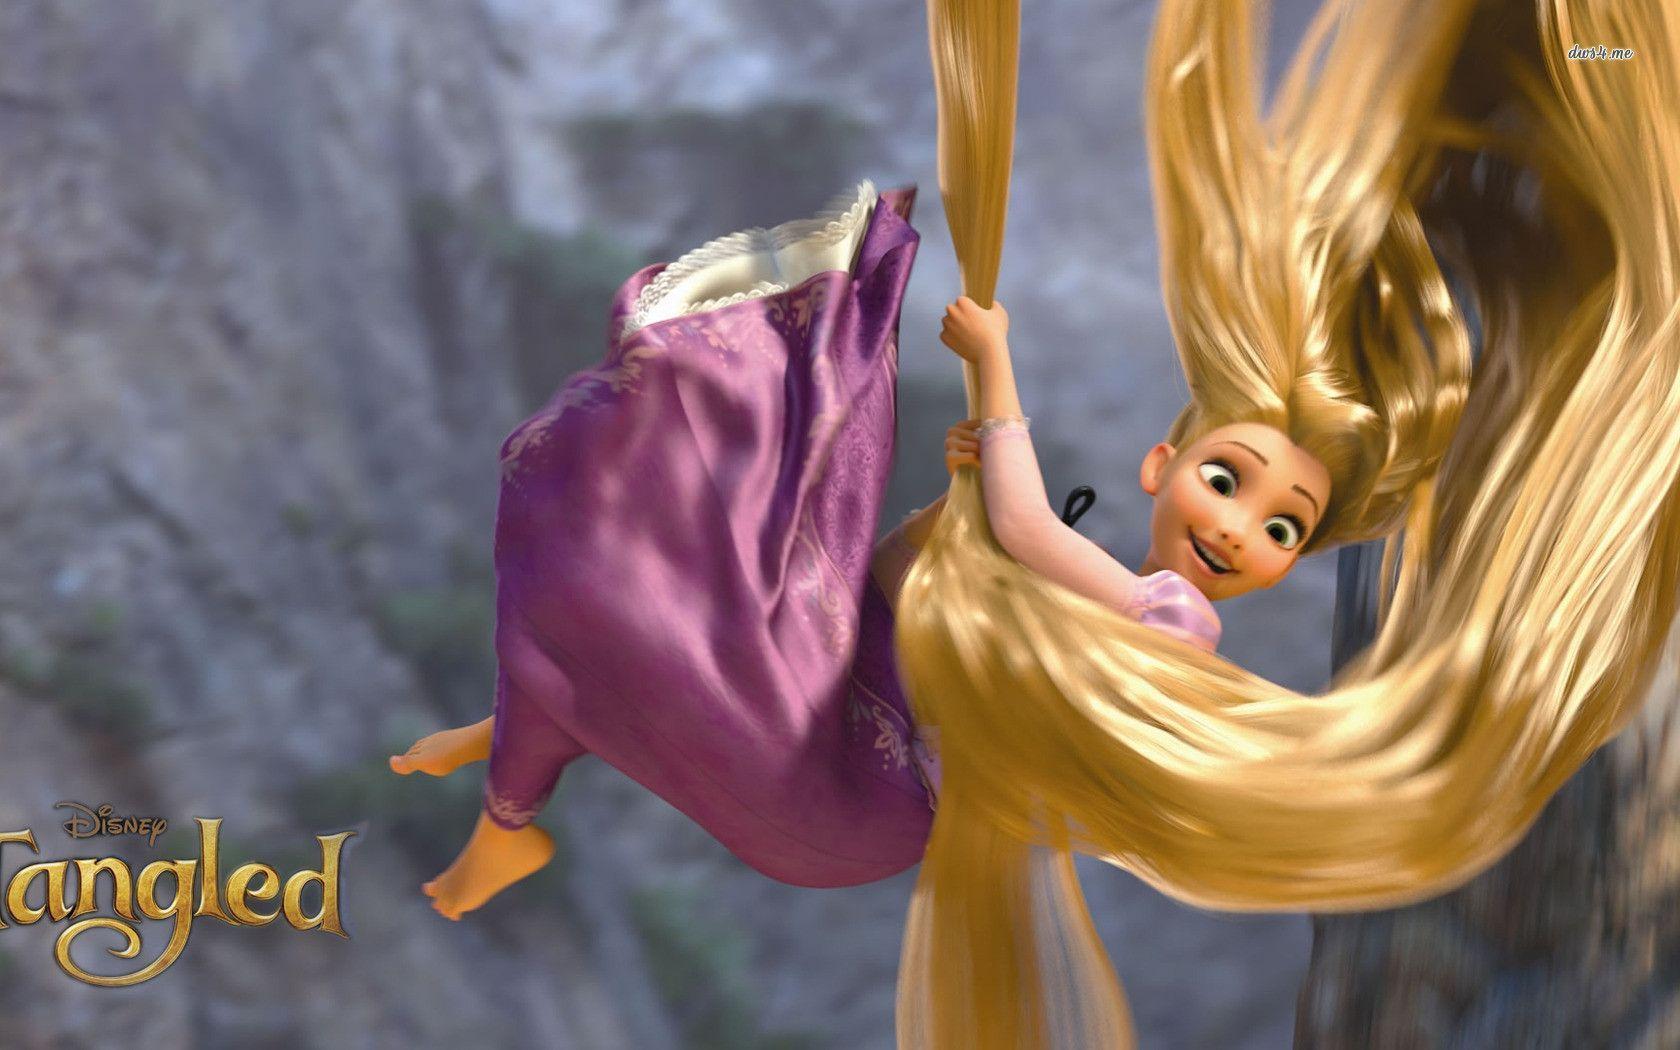 Rapunzel wallpaper - Cartoon wallpapers - #